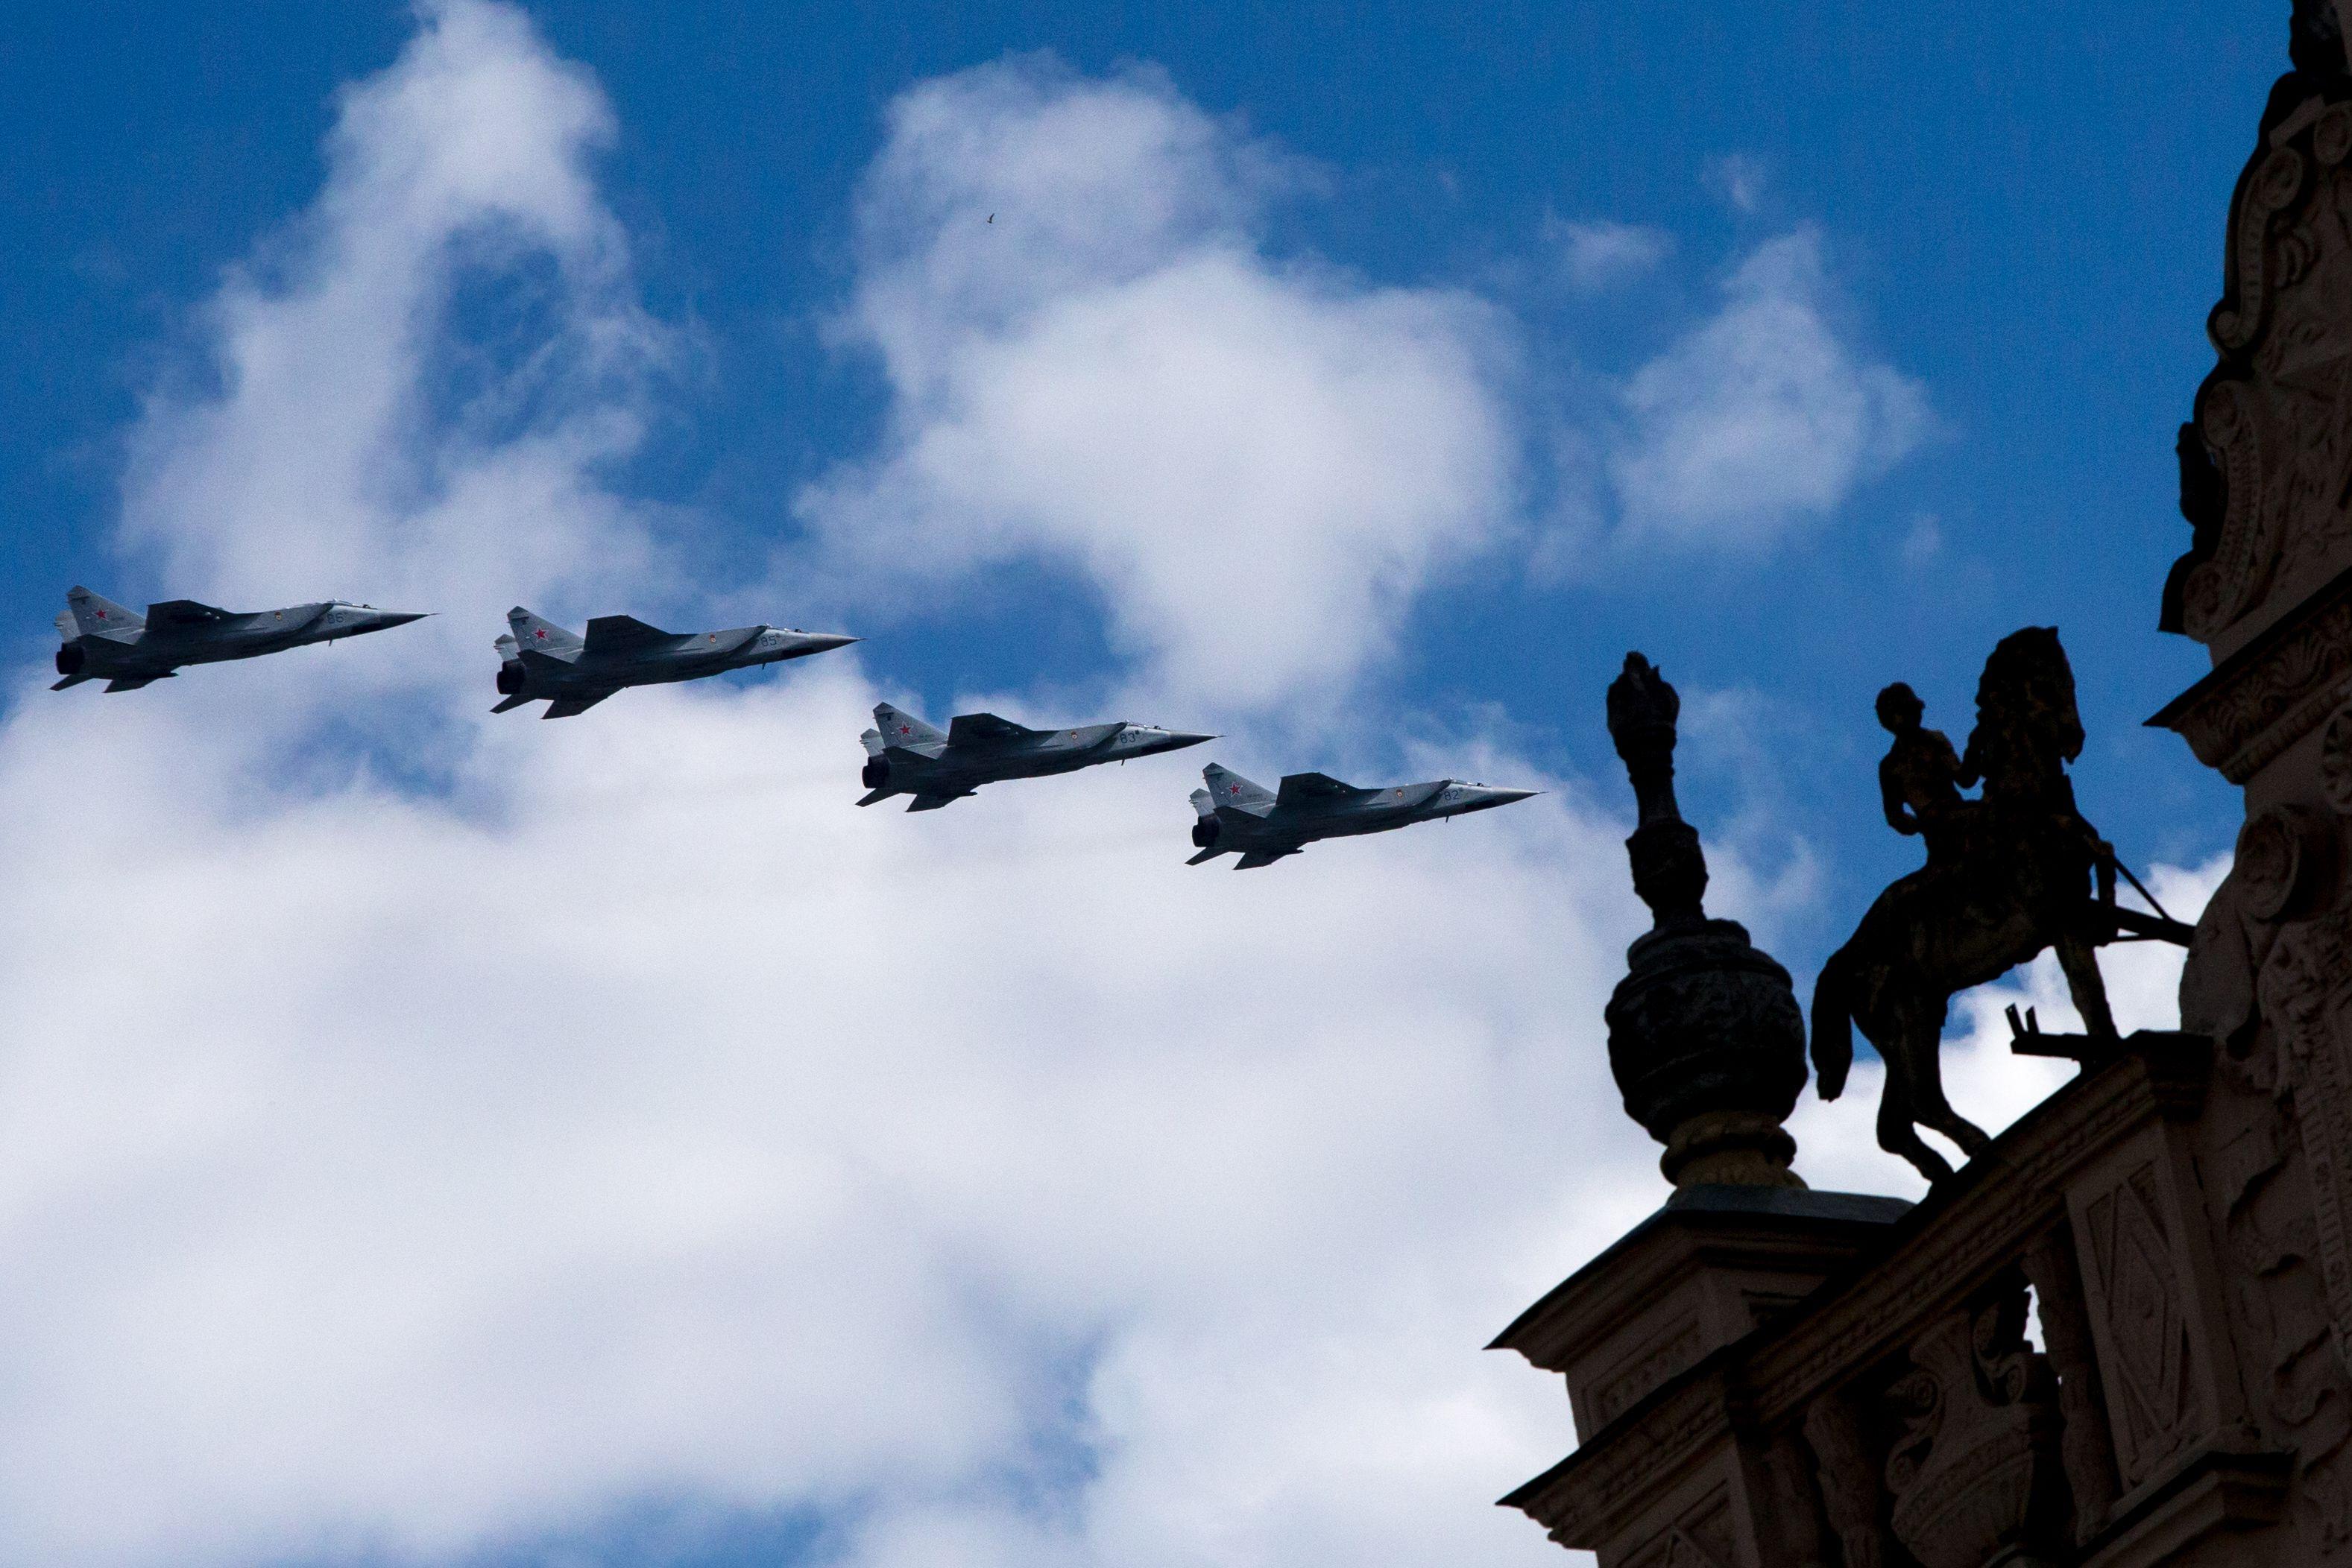 Russia Resumes Fighter Patrols Over the North Pole on petropavlovsk kamchatka russia, yuzhno-sakhalinsk russia, petrozavodsk russia, petropavlovsk-kamchatsky russia, kamchatka peninsula russia, kuril islands russia, siberia russia, yoshkar-ola russia, bilibino russia,